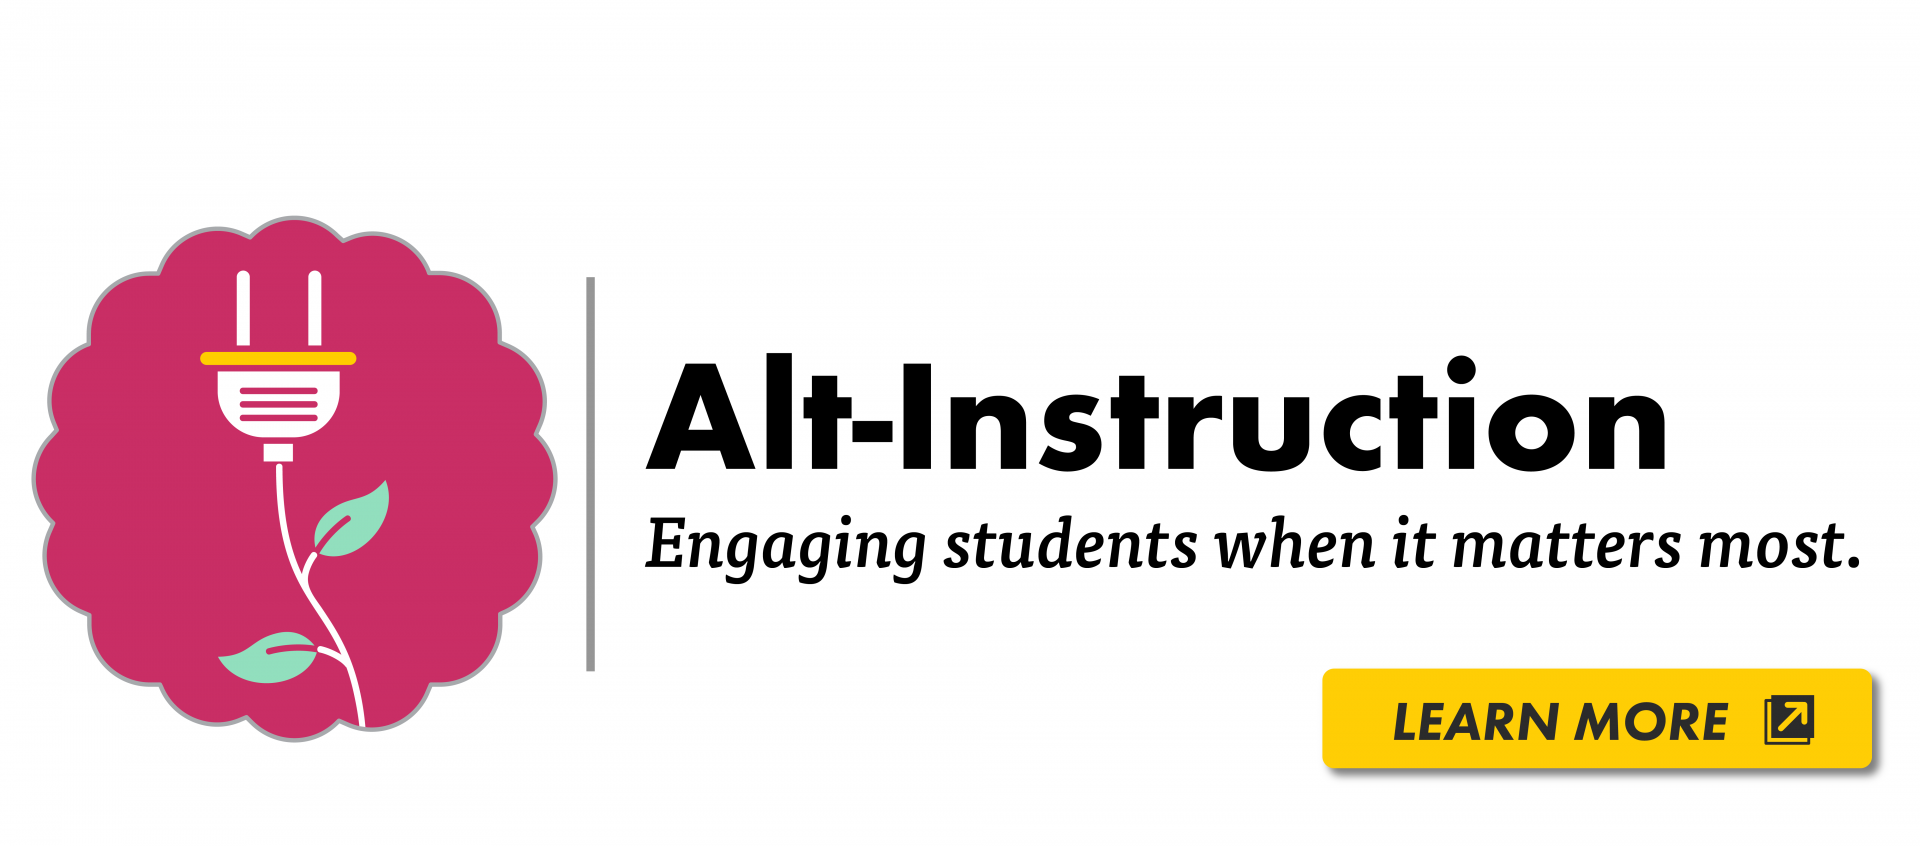 Alt-Instruction Certificate